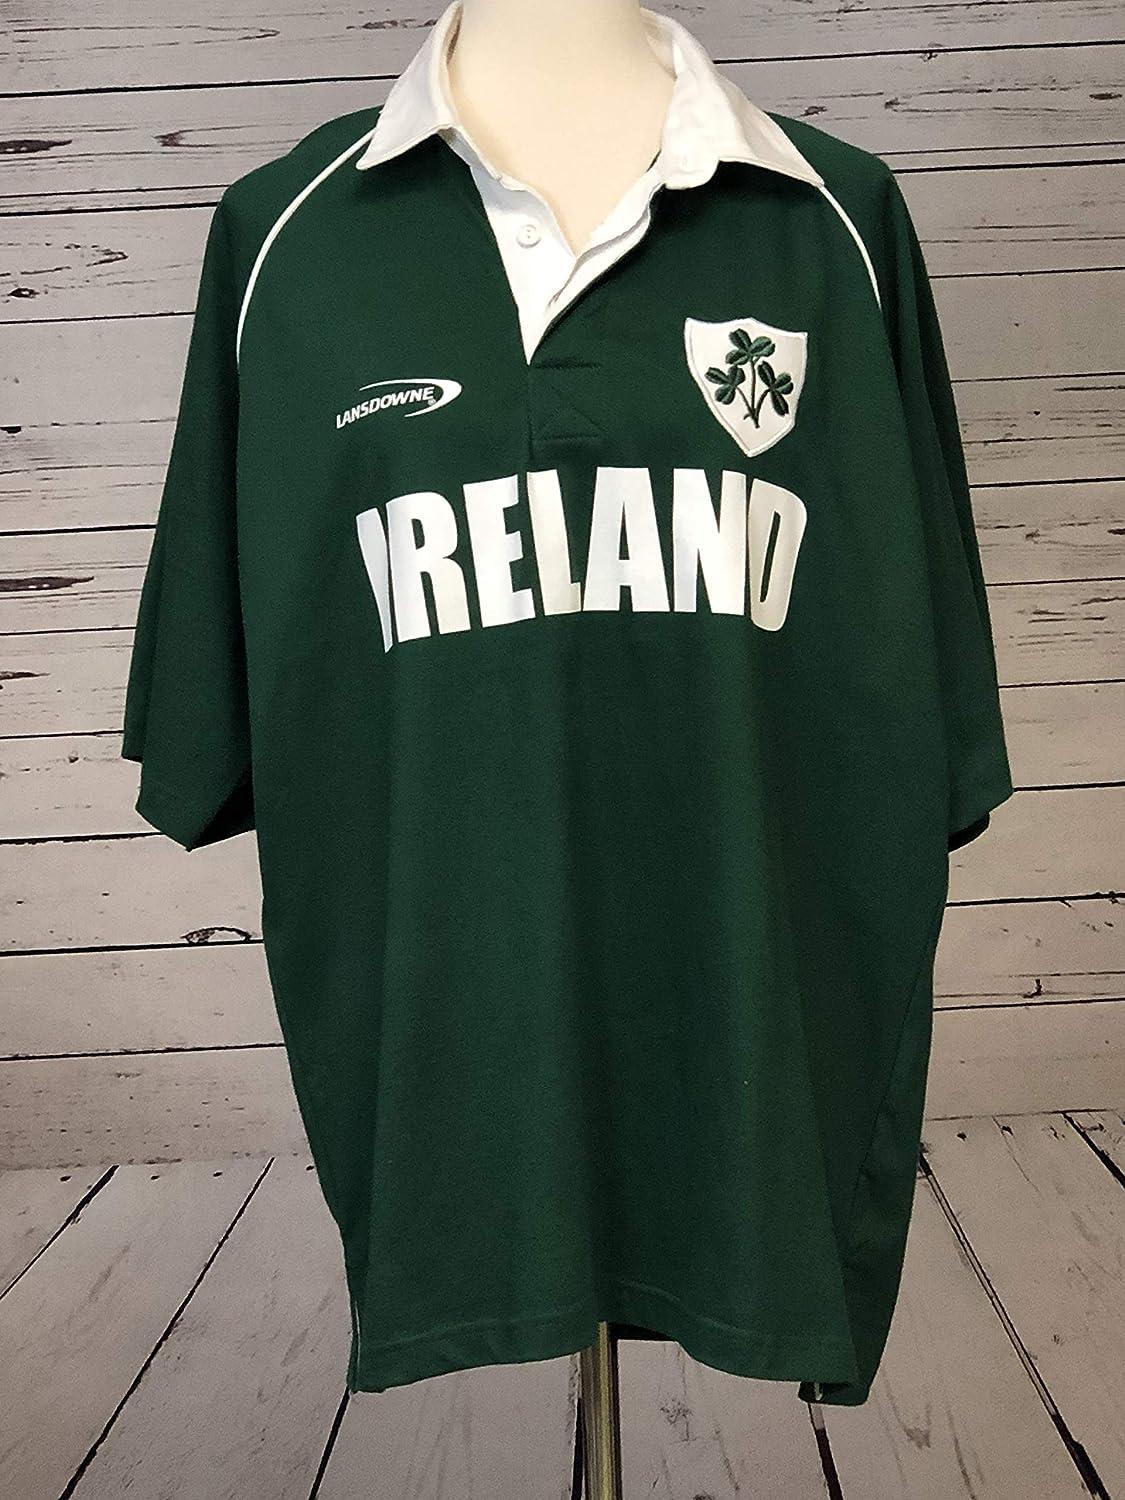 Lansdowne Ireland Mens Polo Rugby Short Sleeve Shirt Large Green